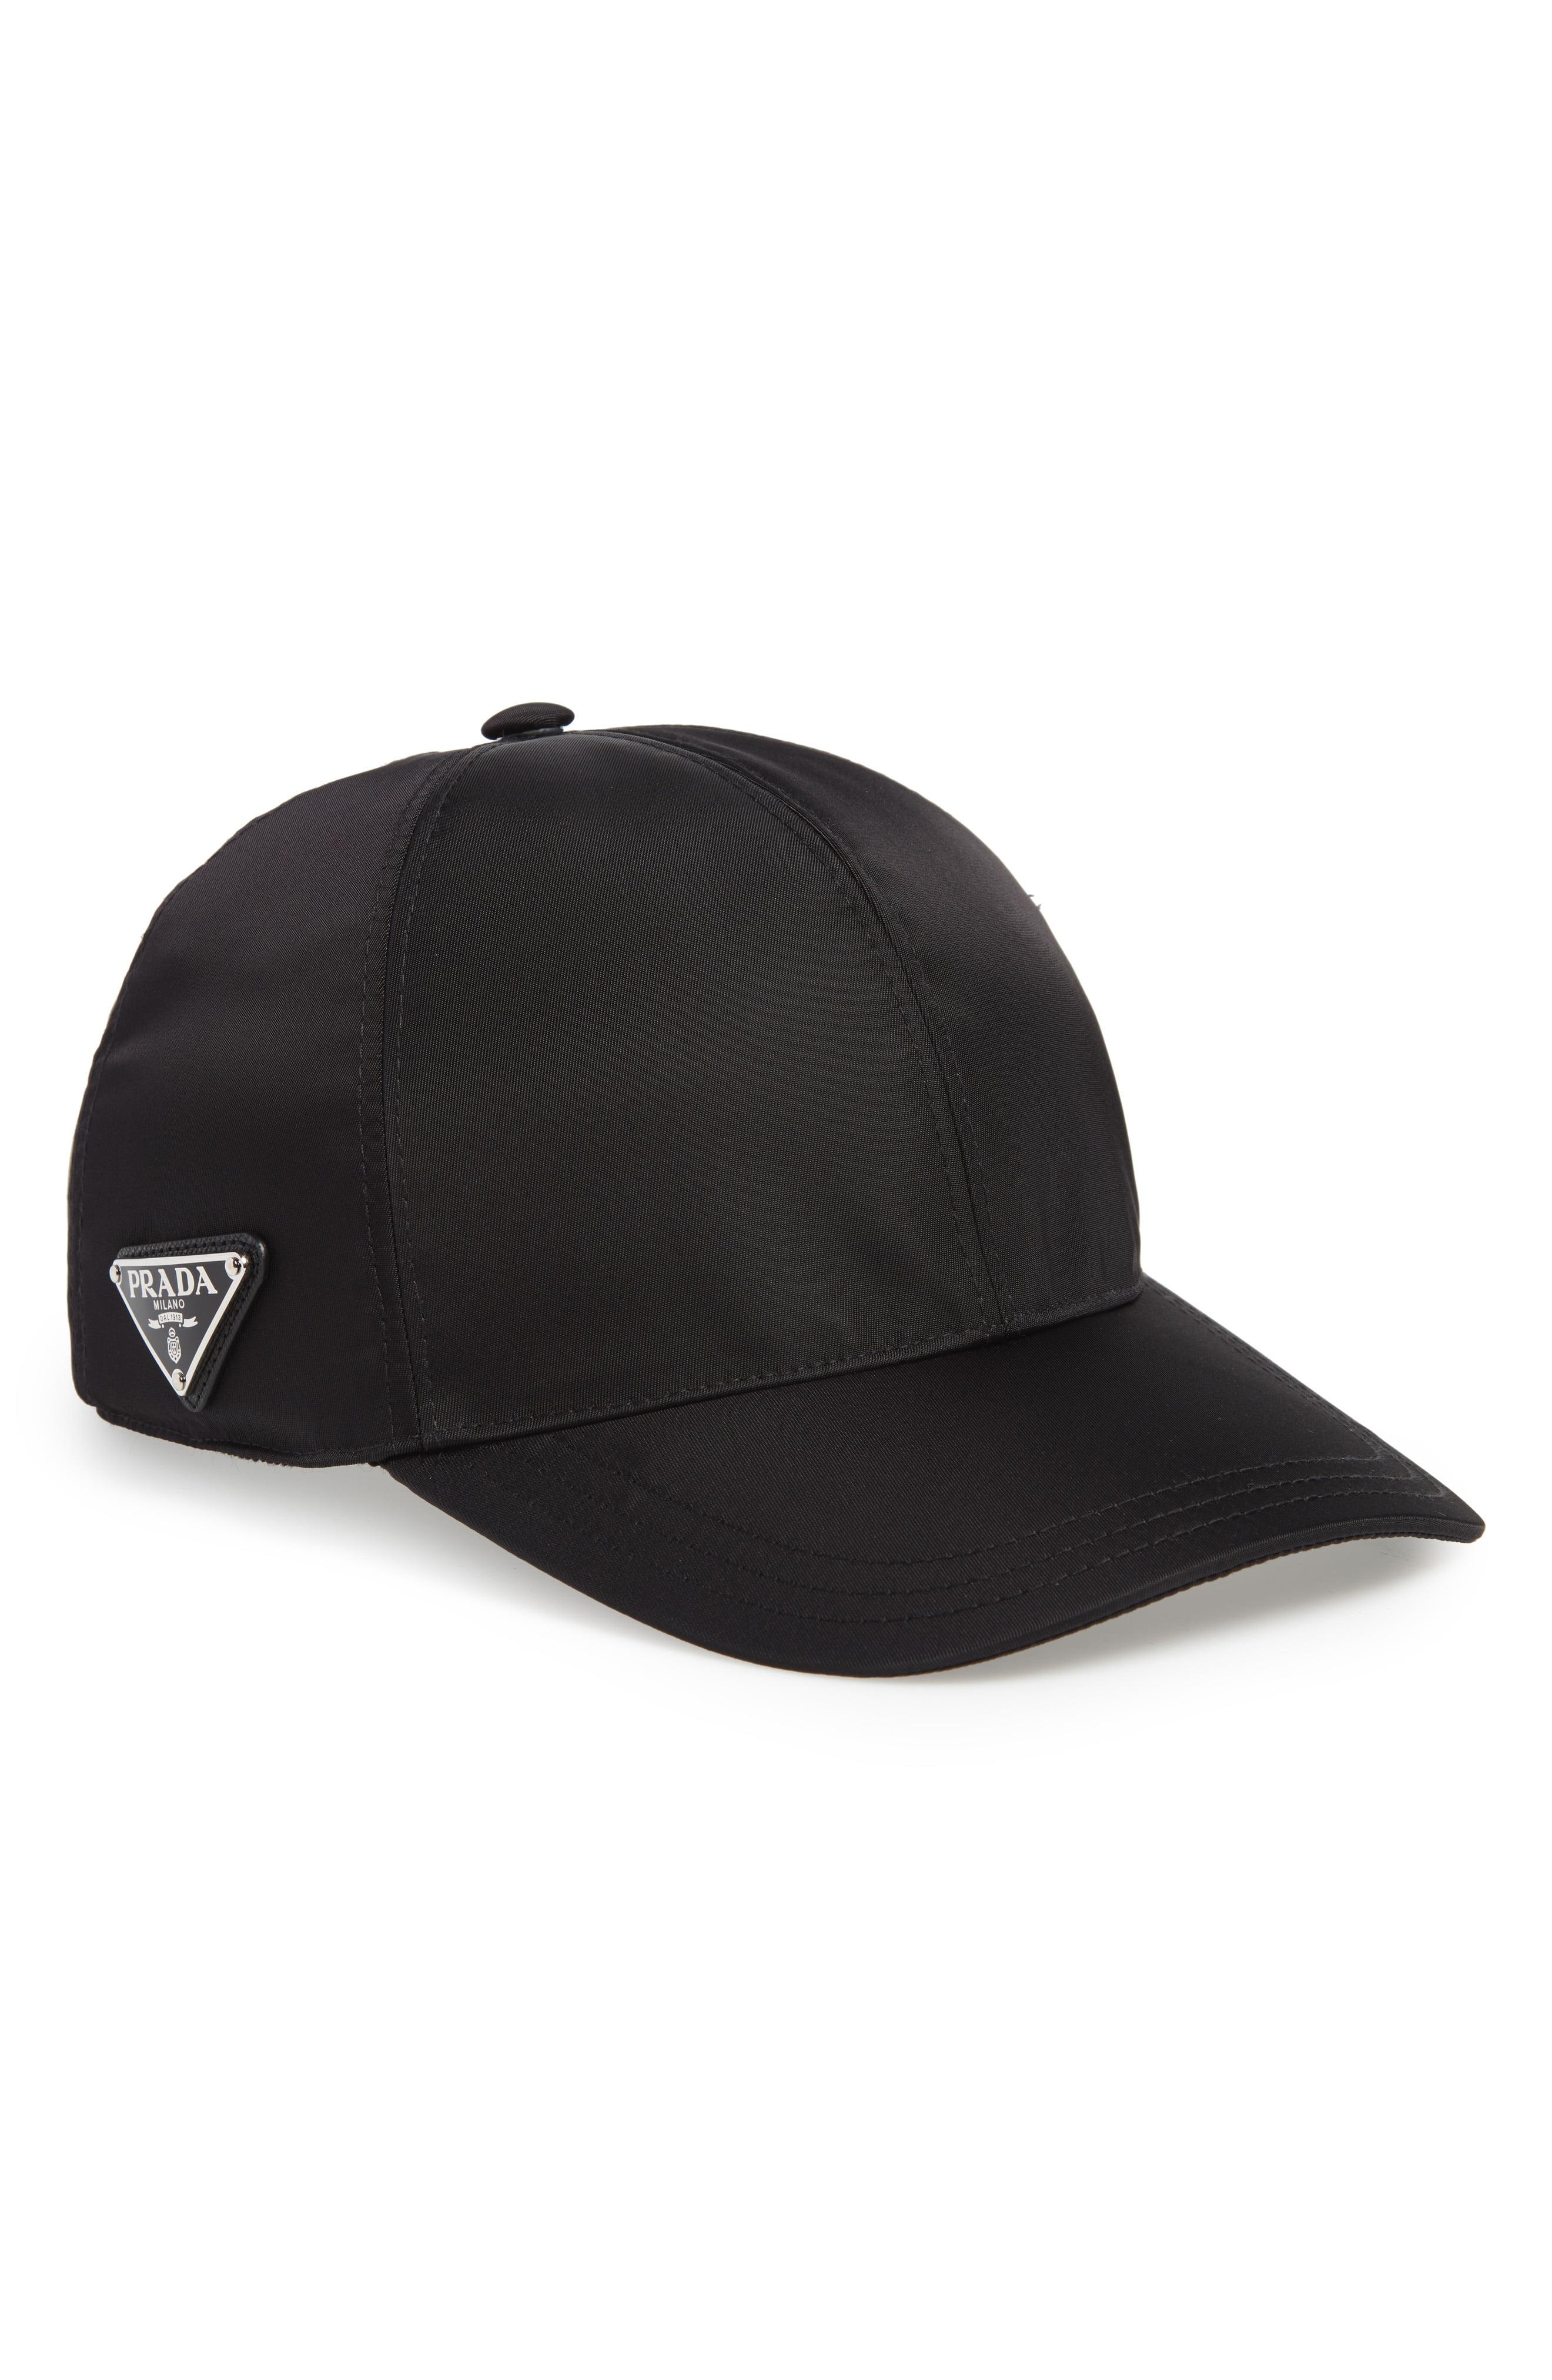 db7ea20f8 Men's Prada Nylon Ball Cap –   The Fashionisto